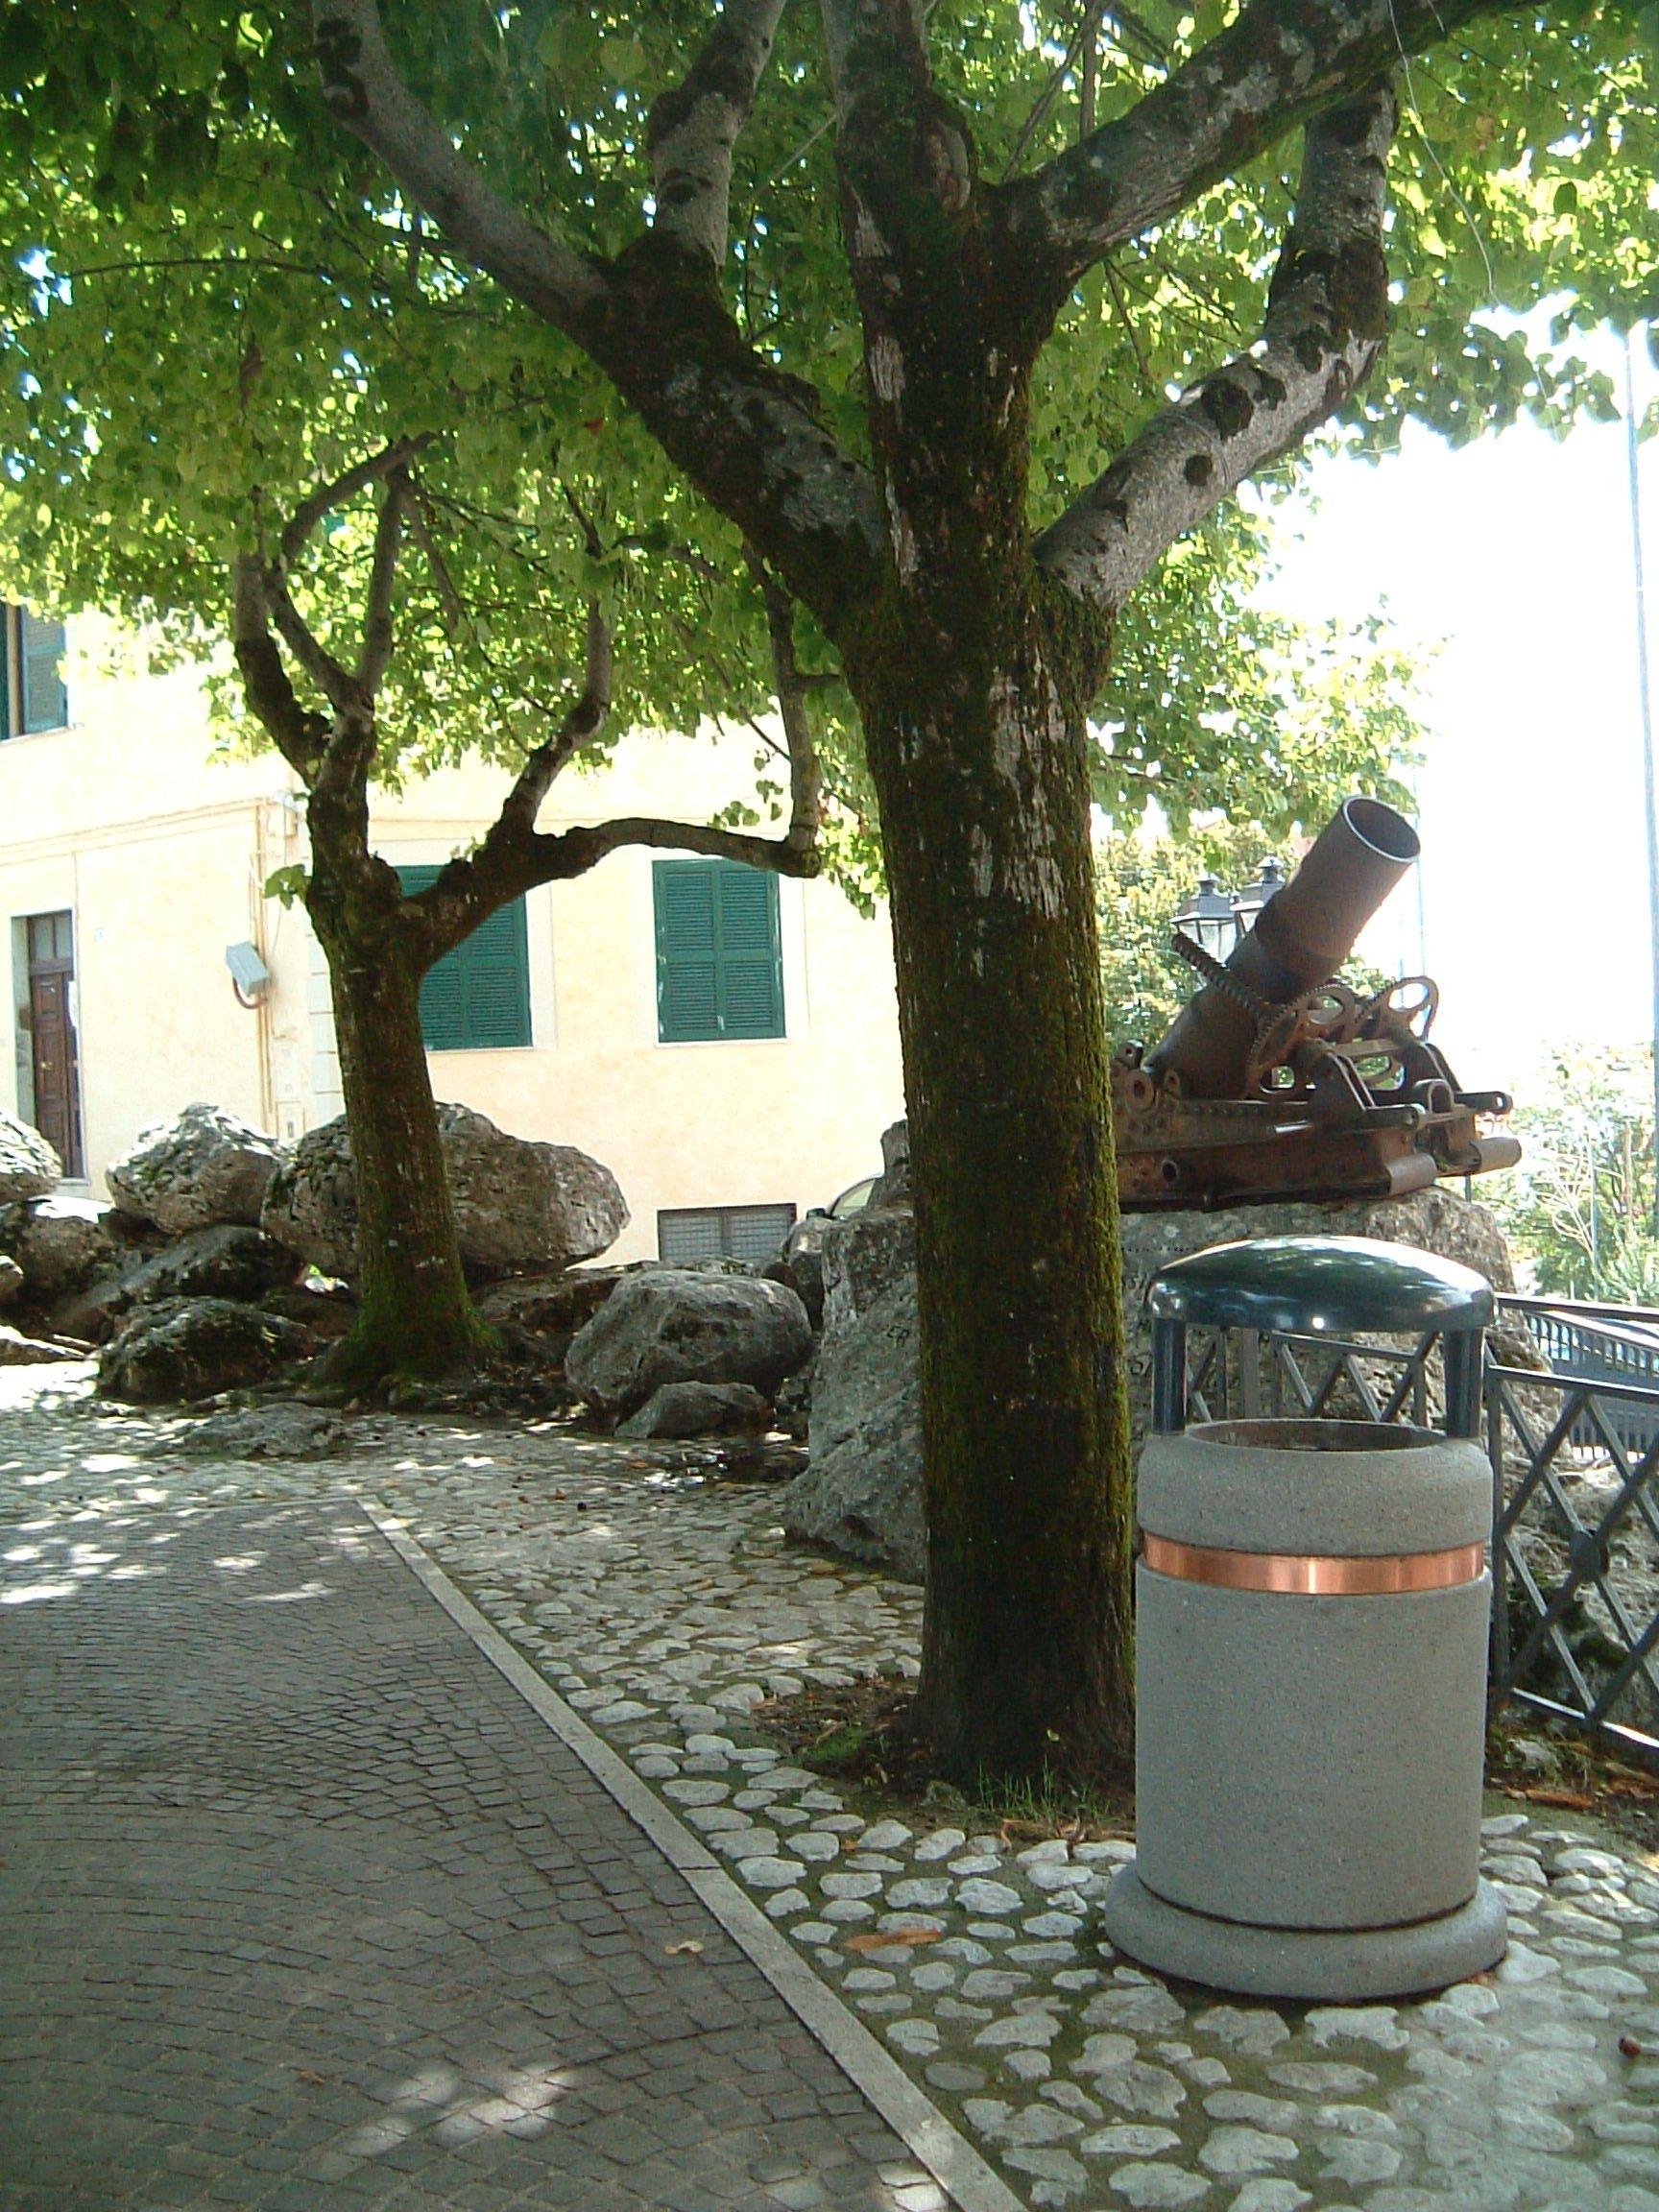 Sorrento litterbin bellitalia concrete street furniture for Arredo urbano ancona